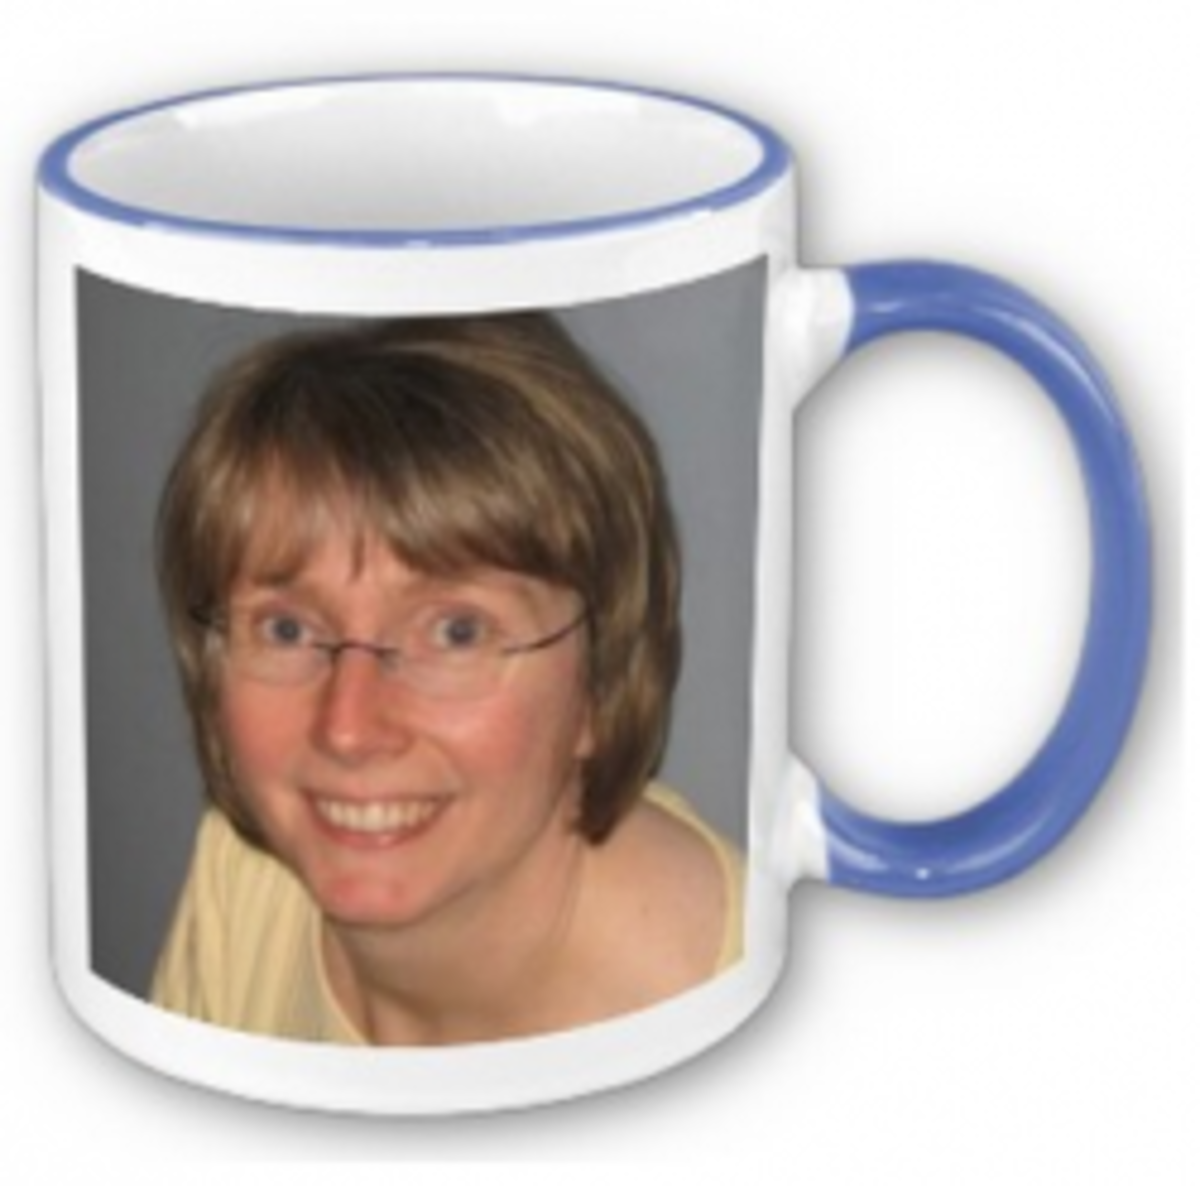 Put Your Own Photos On A Coffee Mug